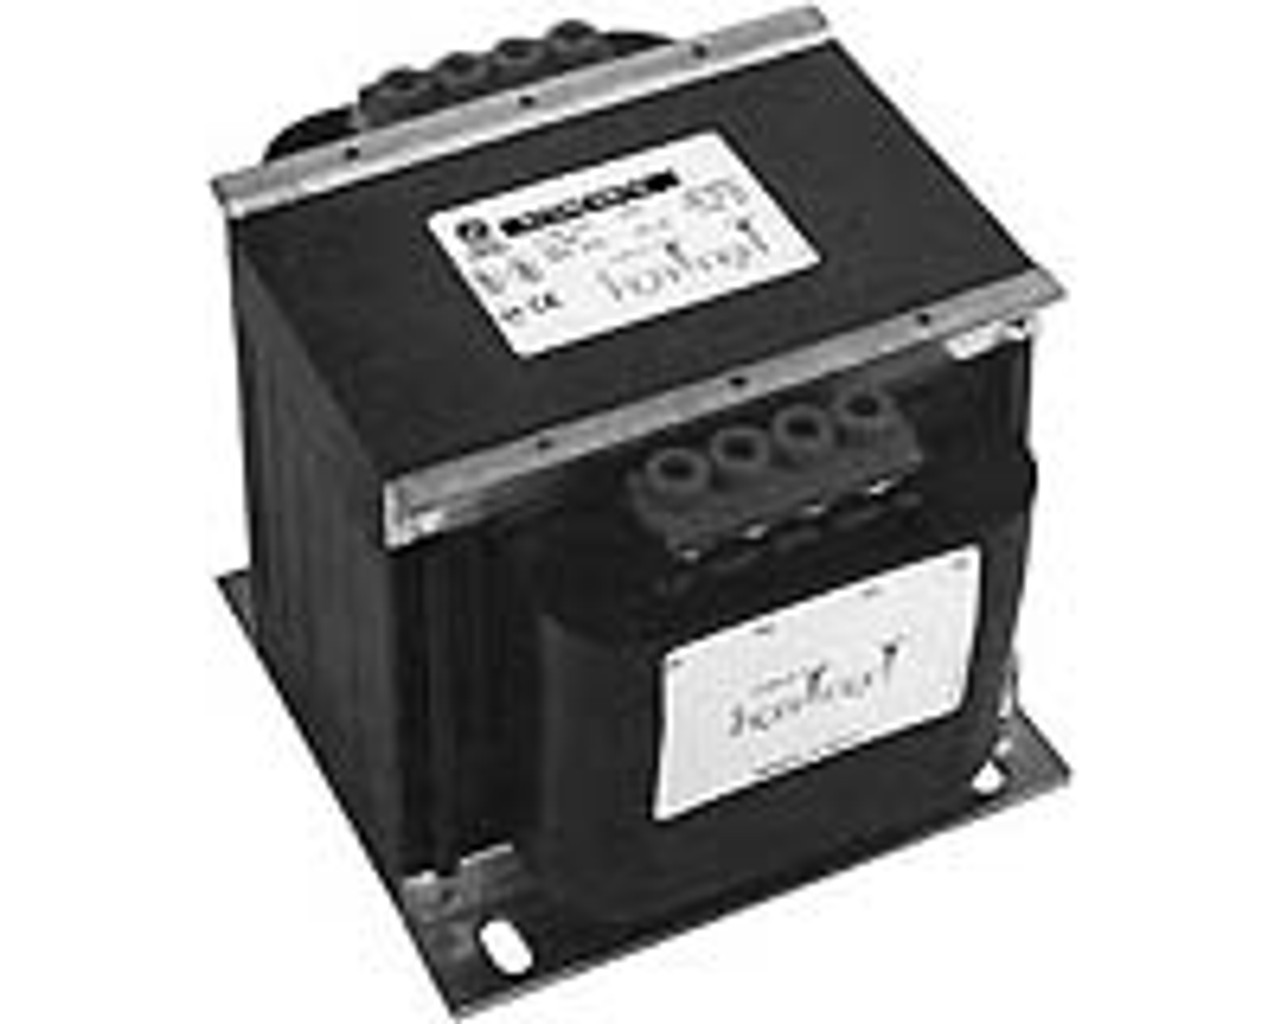 GE 9T58K3204 - 0.75 KVA 208/230/460 TO 115/95 VOLTS 1PH TRANSFORMER - New